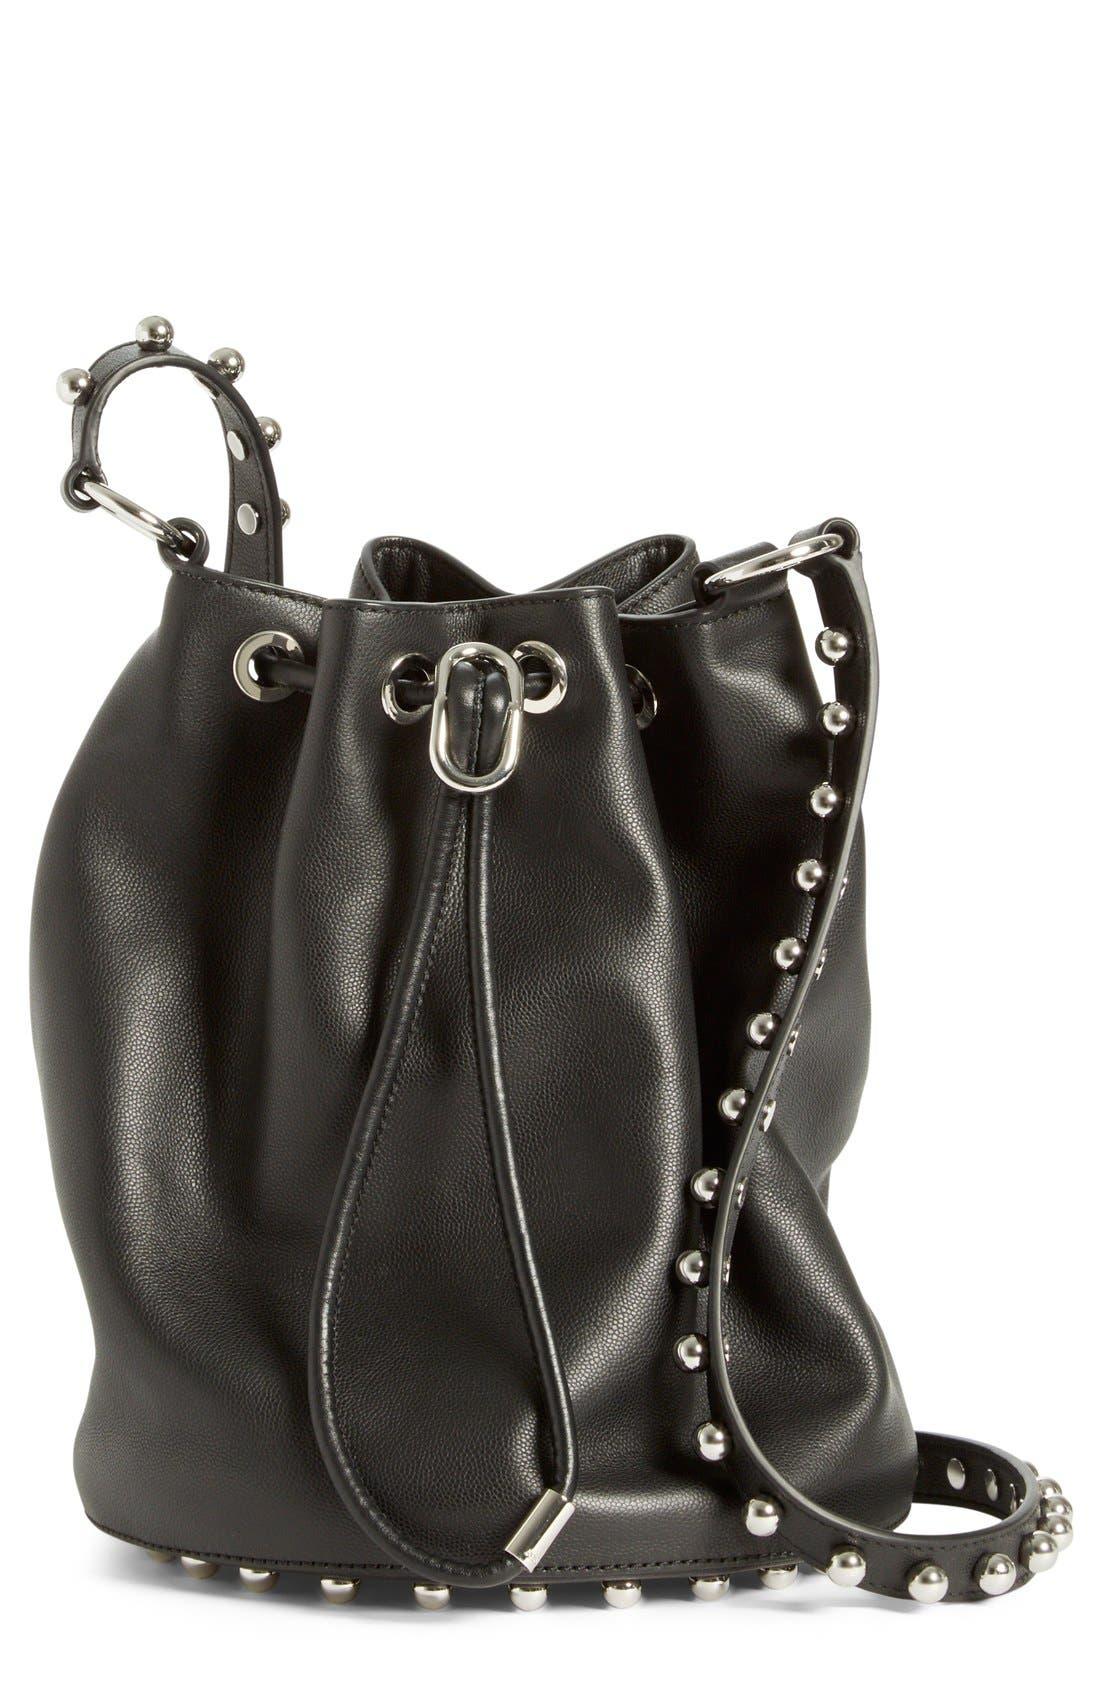 ALEXANDER WANG, 'Alfa' Studded Leather Bucket Bag, Main thumbnail 1, color, 001